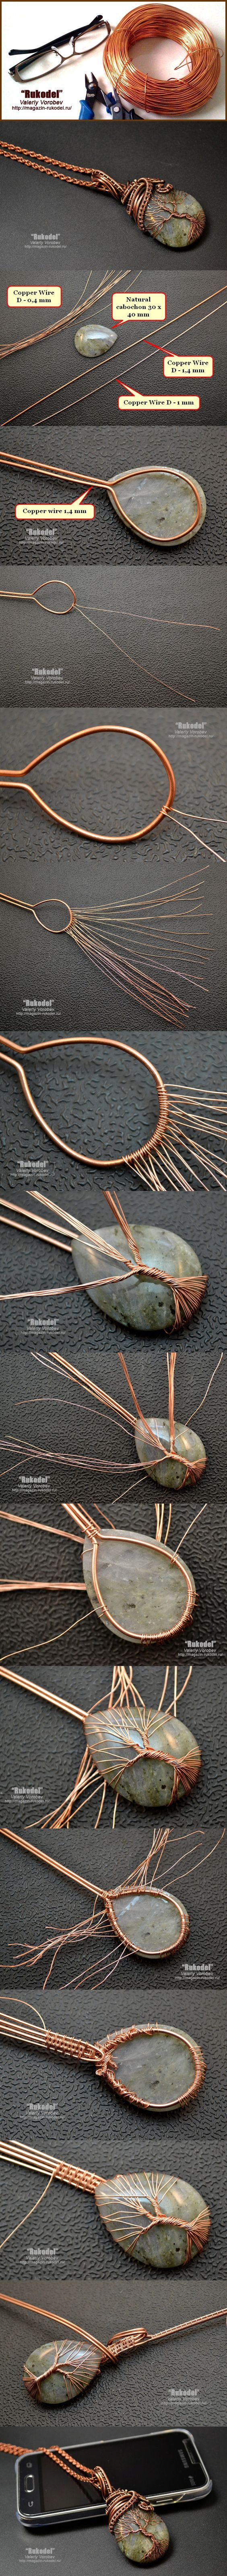 Purple Avocado - photography, food styling, recipes & travel